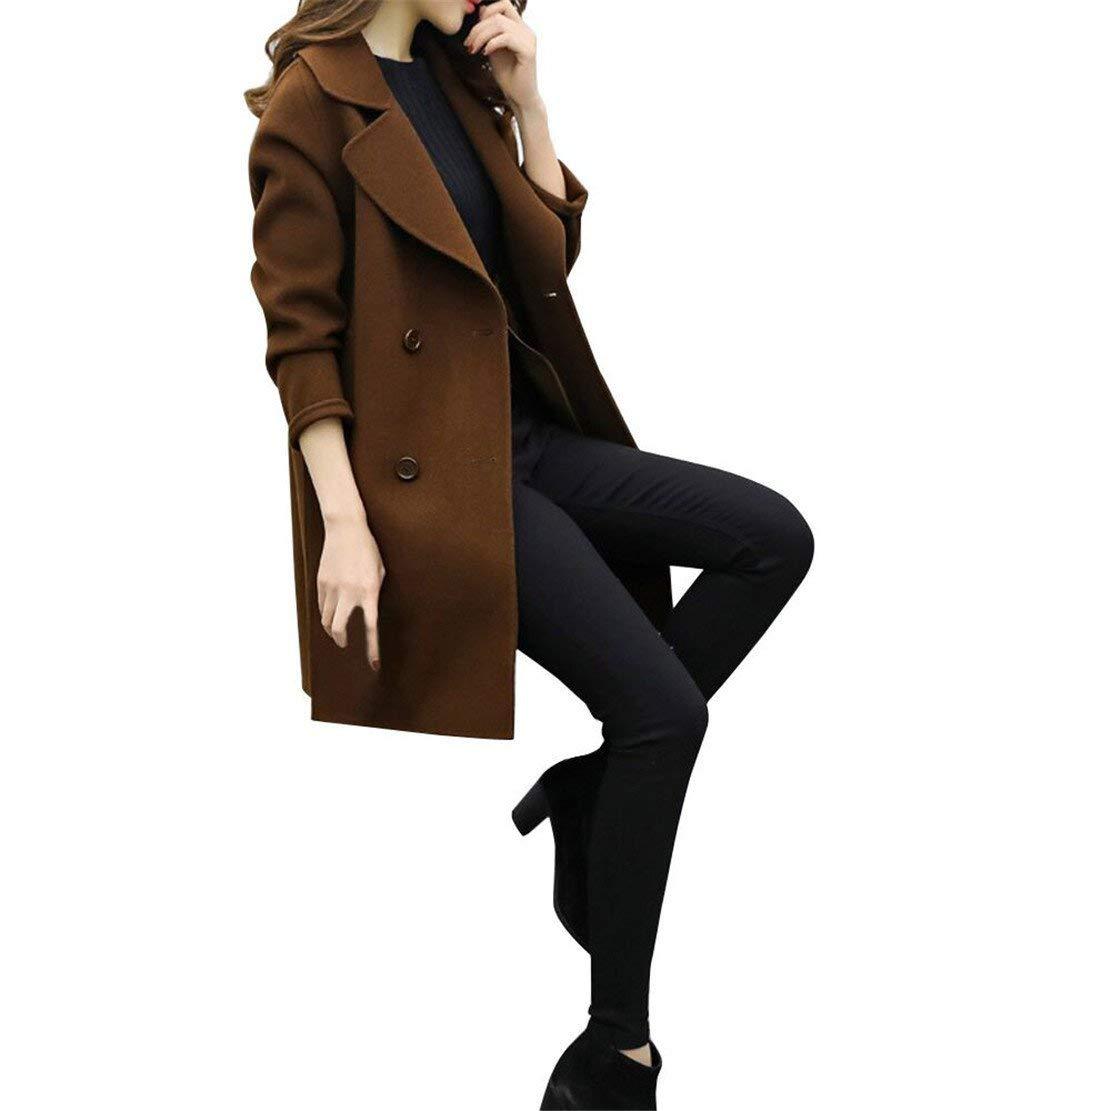 Mose New Women Coat Women Fashion Autumn Winter Jacket Tops Casual Long Sleeve Slim Cardigan Overcoat (Coffee, 2XL) 51tpkFLJMKL